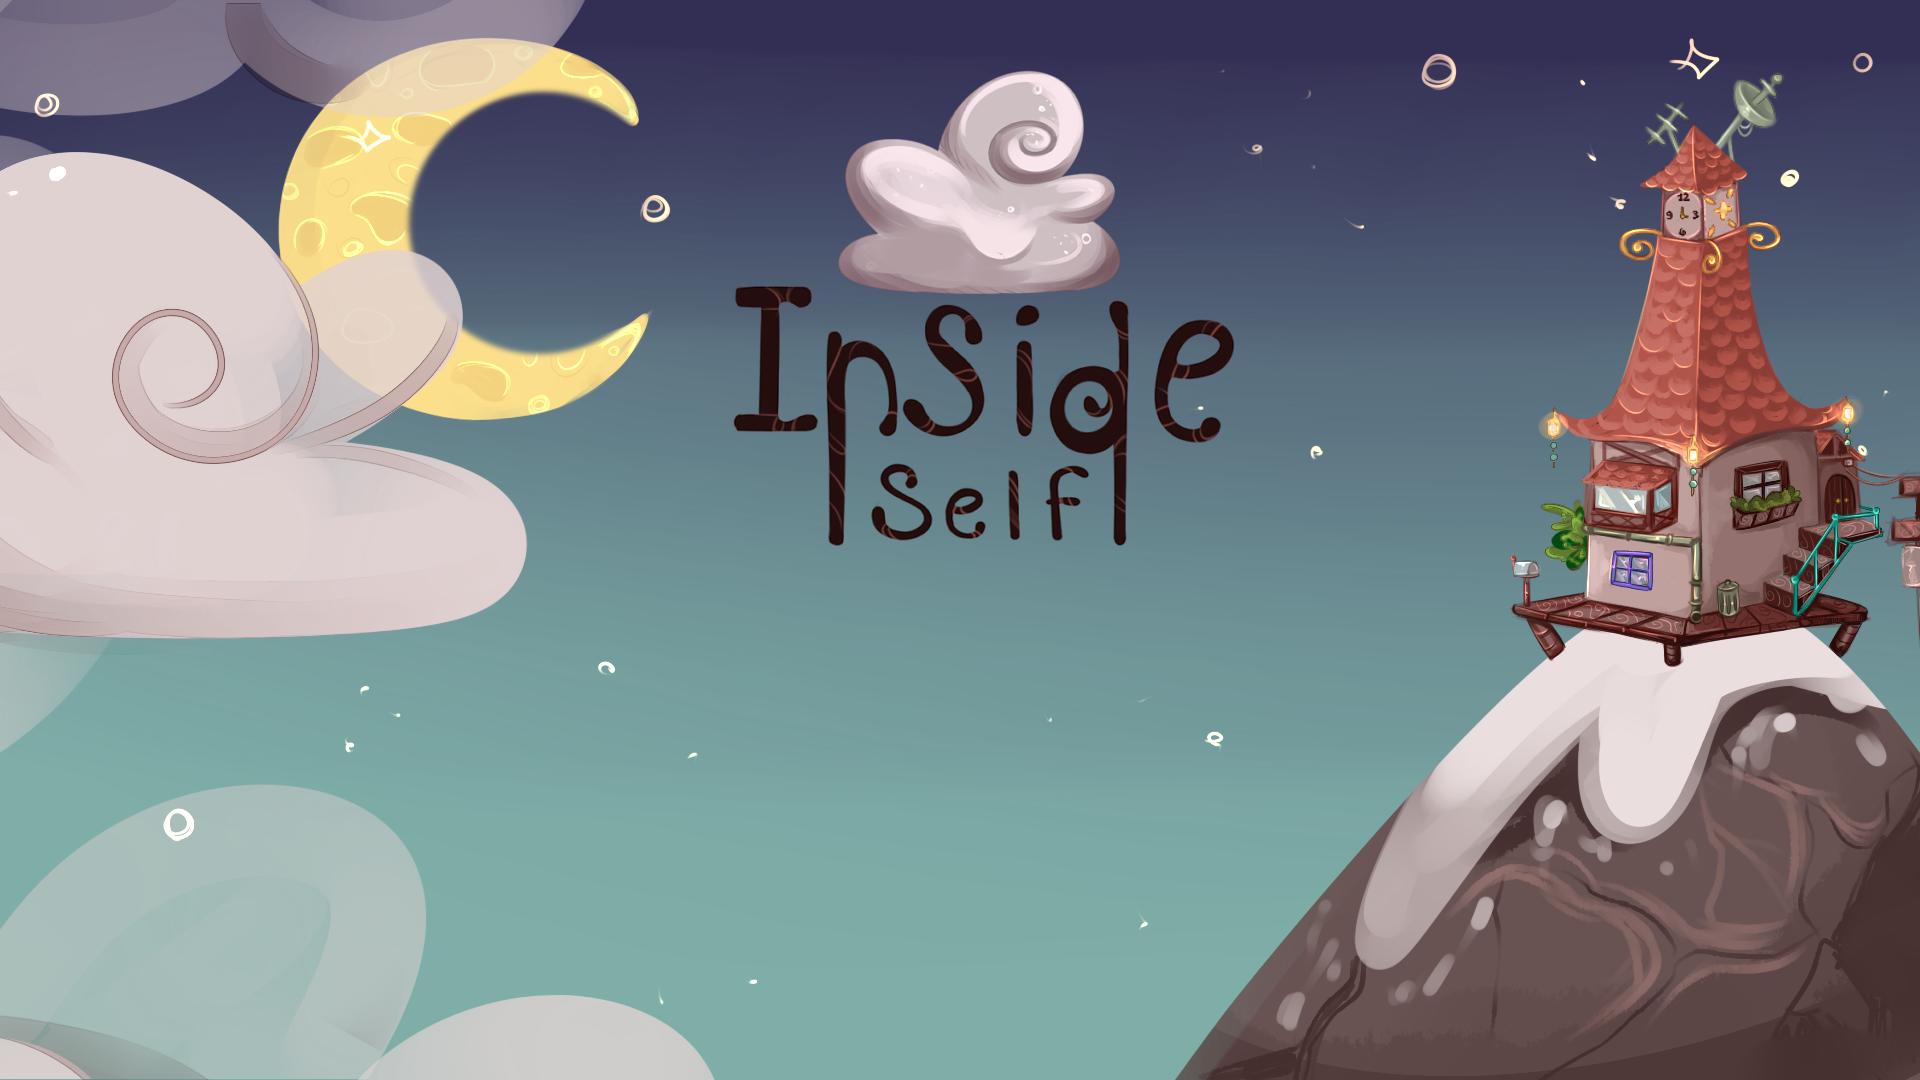 Inside Self